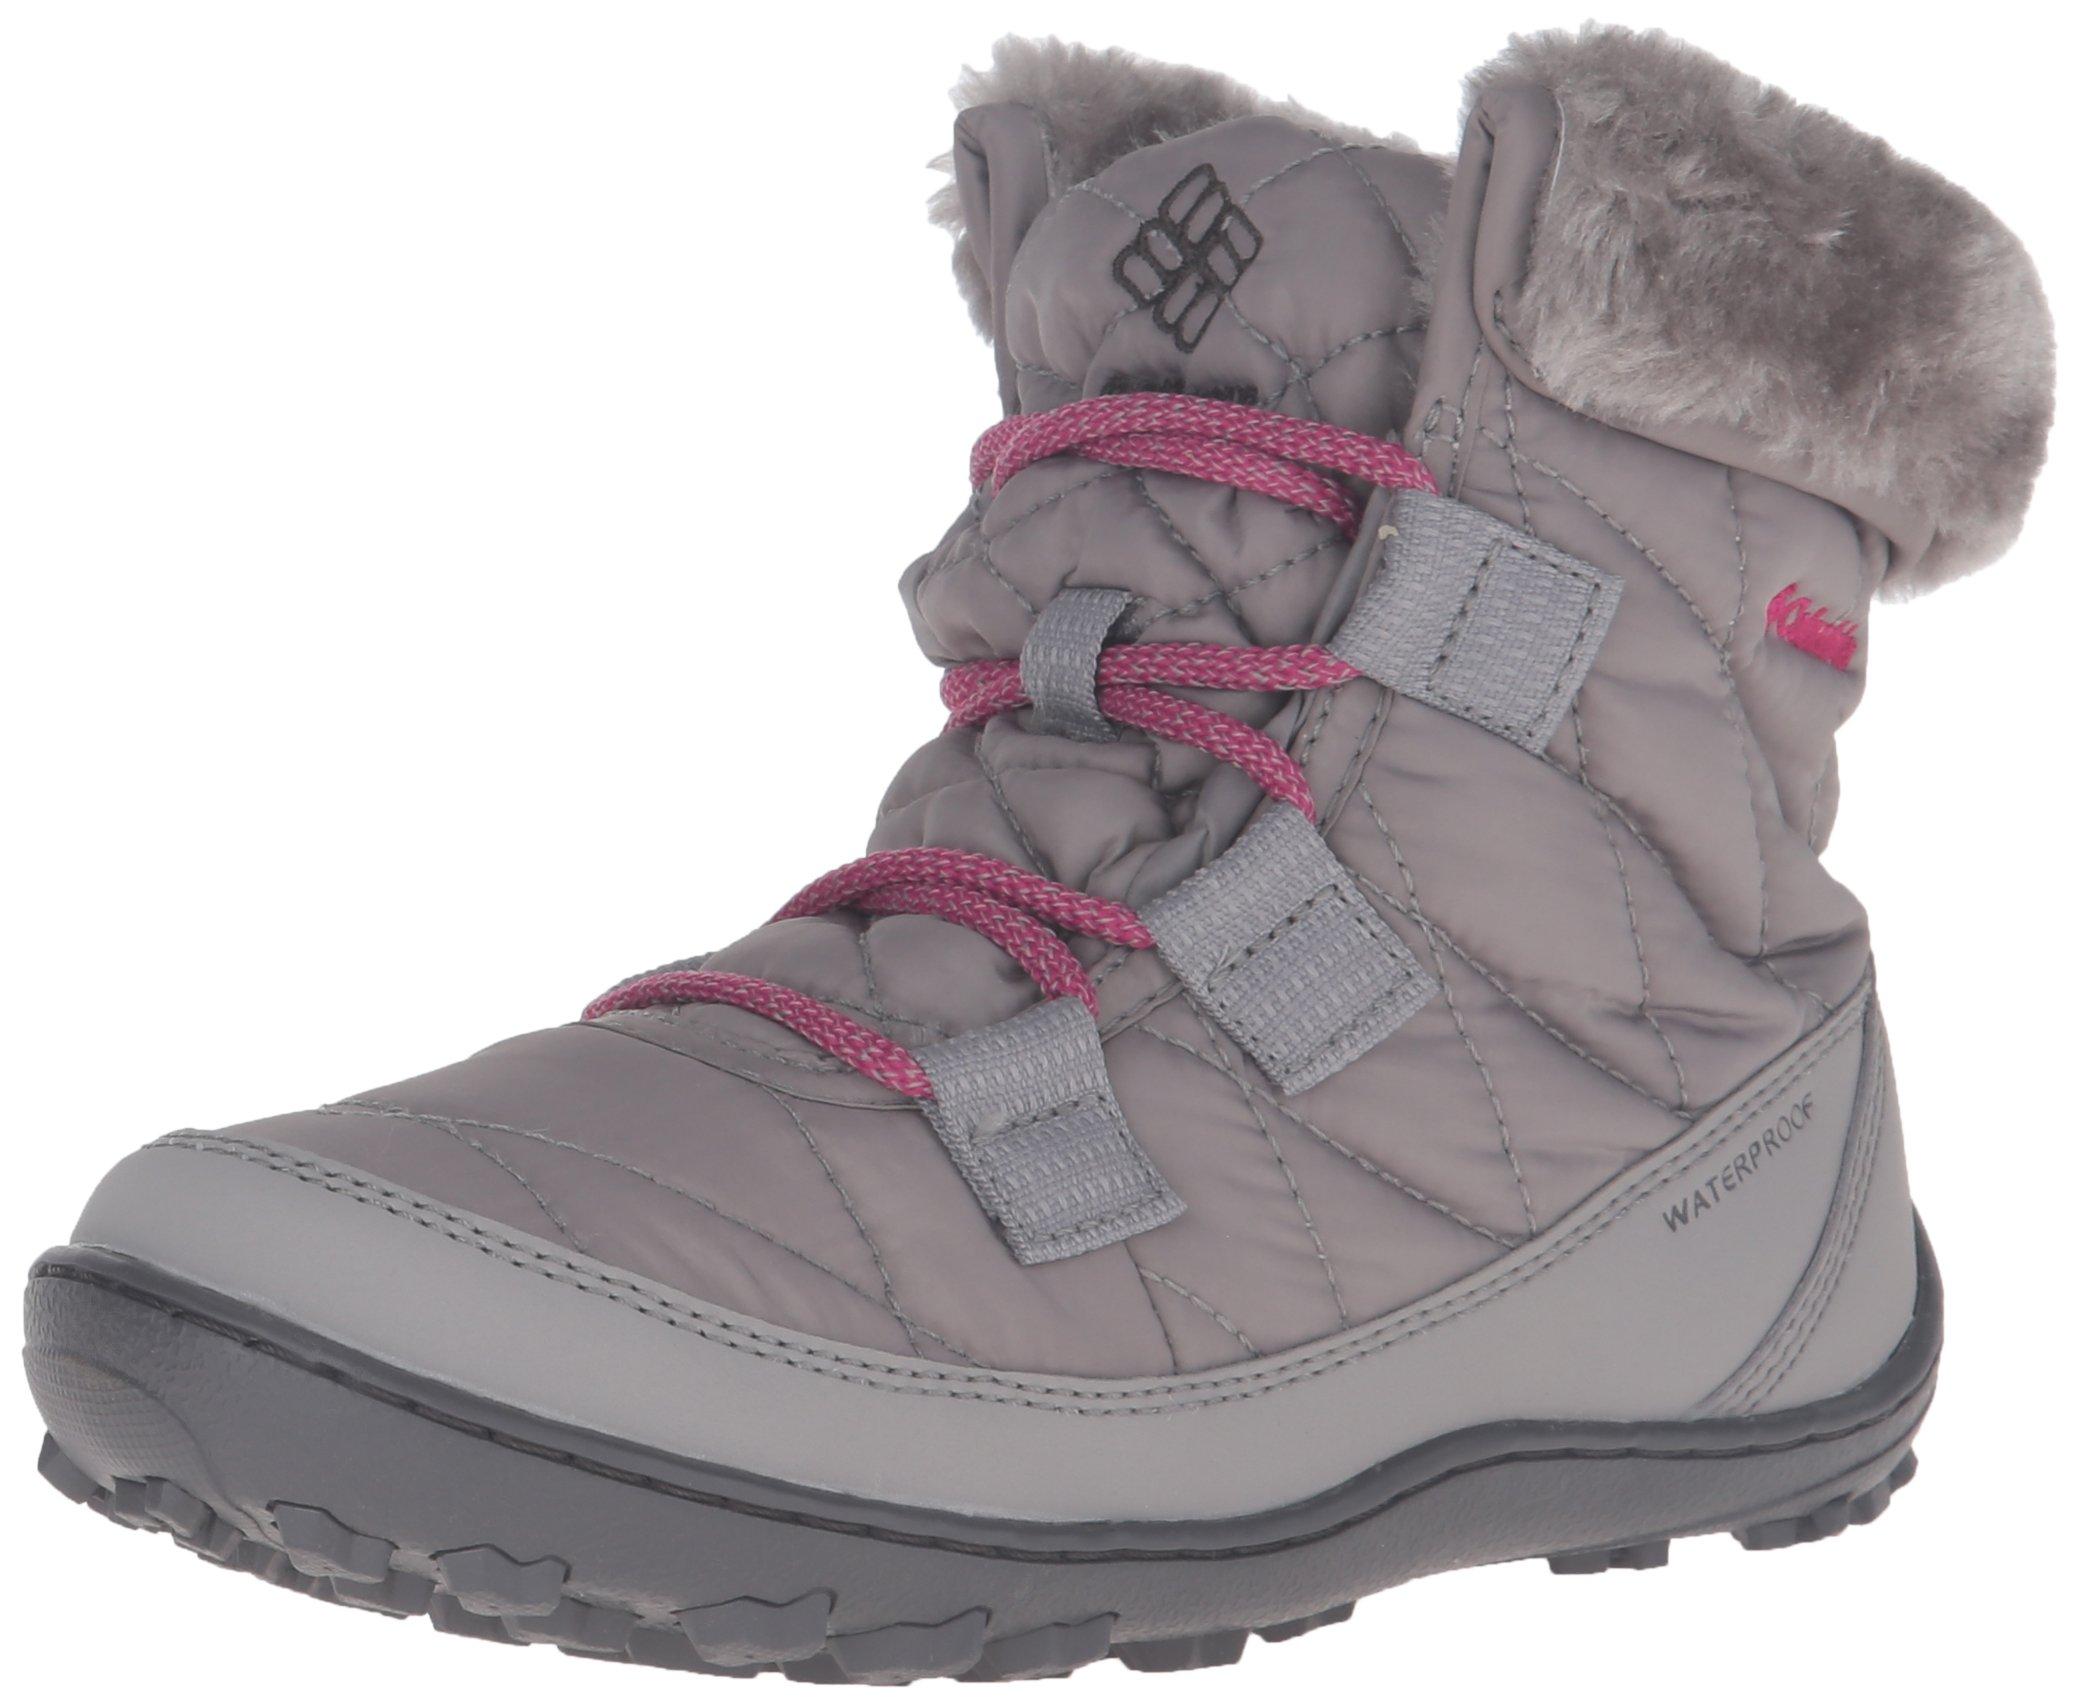 Columbia Girls' Youth Minx Shorty Omni-Heat Waterproof Snow Boot, Light Grey, Deep Blush, 2 M US Little Kid